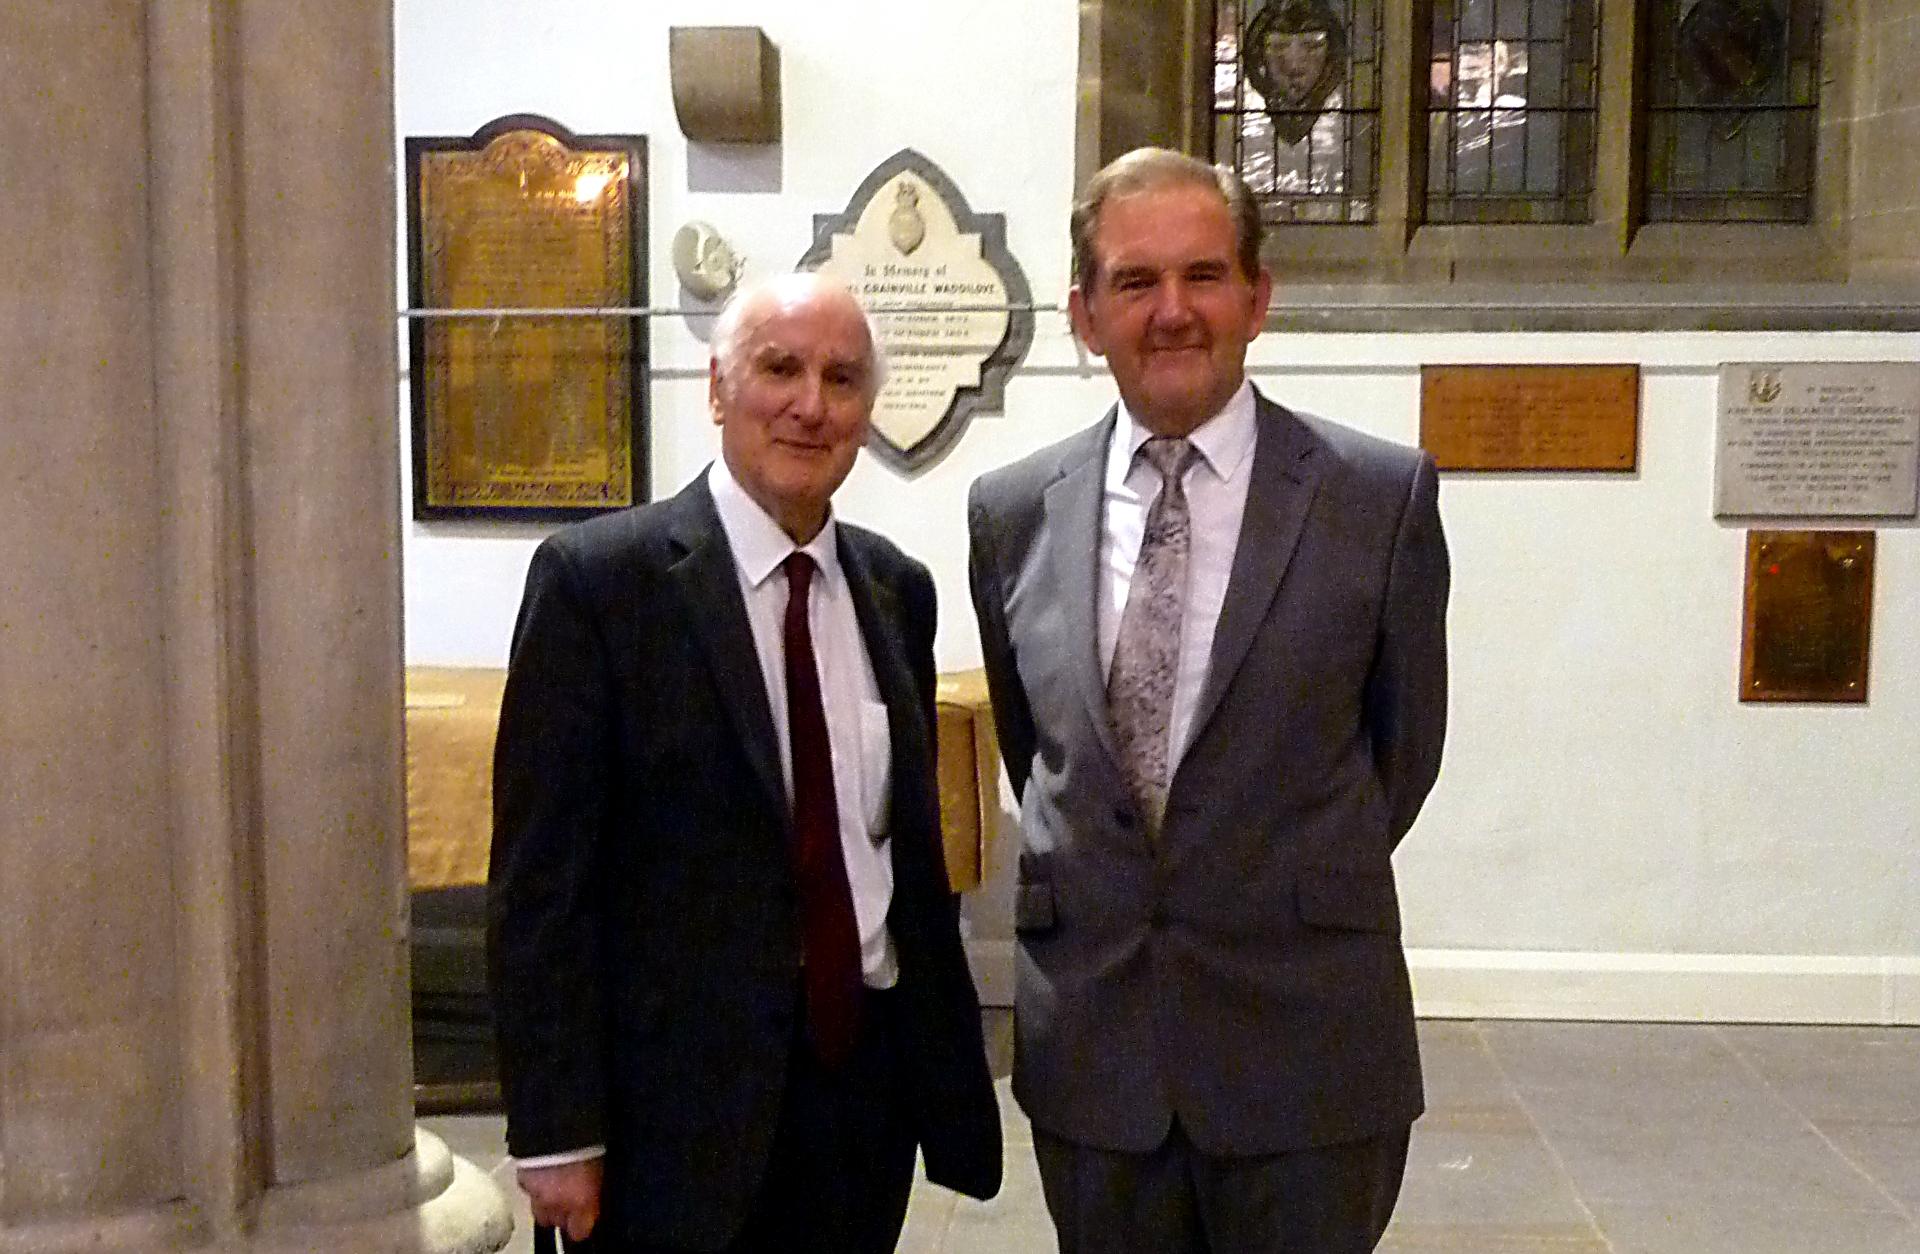 PHS Meeting Monday 7th October 2013 - Stephen Sartin & David Hindle